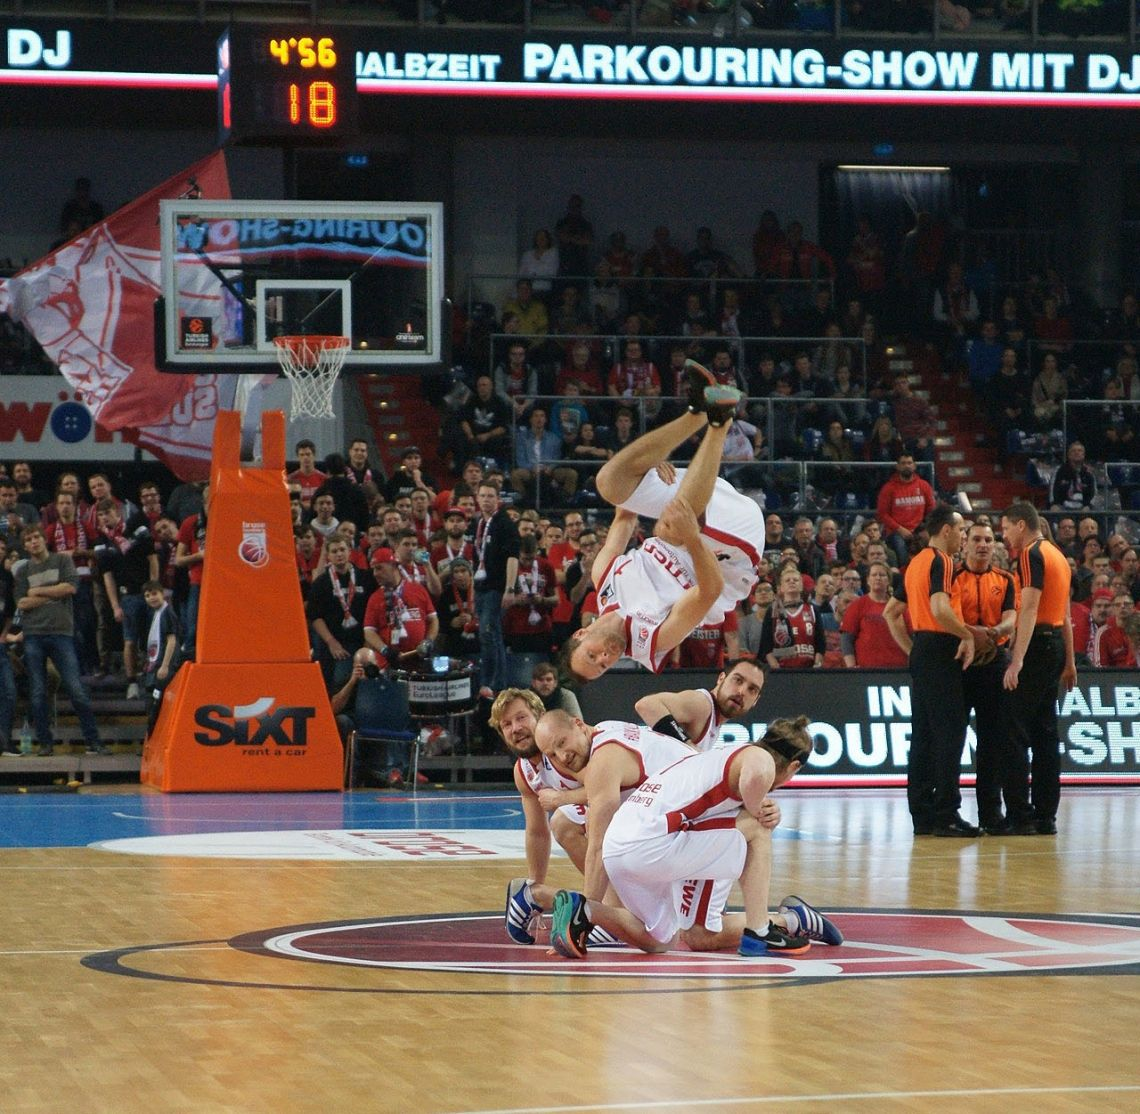 Team Supreme - Parkour meets Basketball - Acrobatic Sport Show